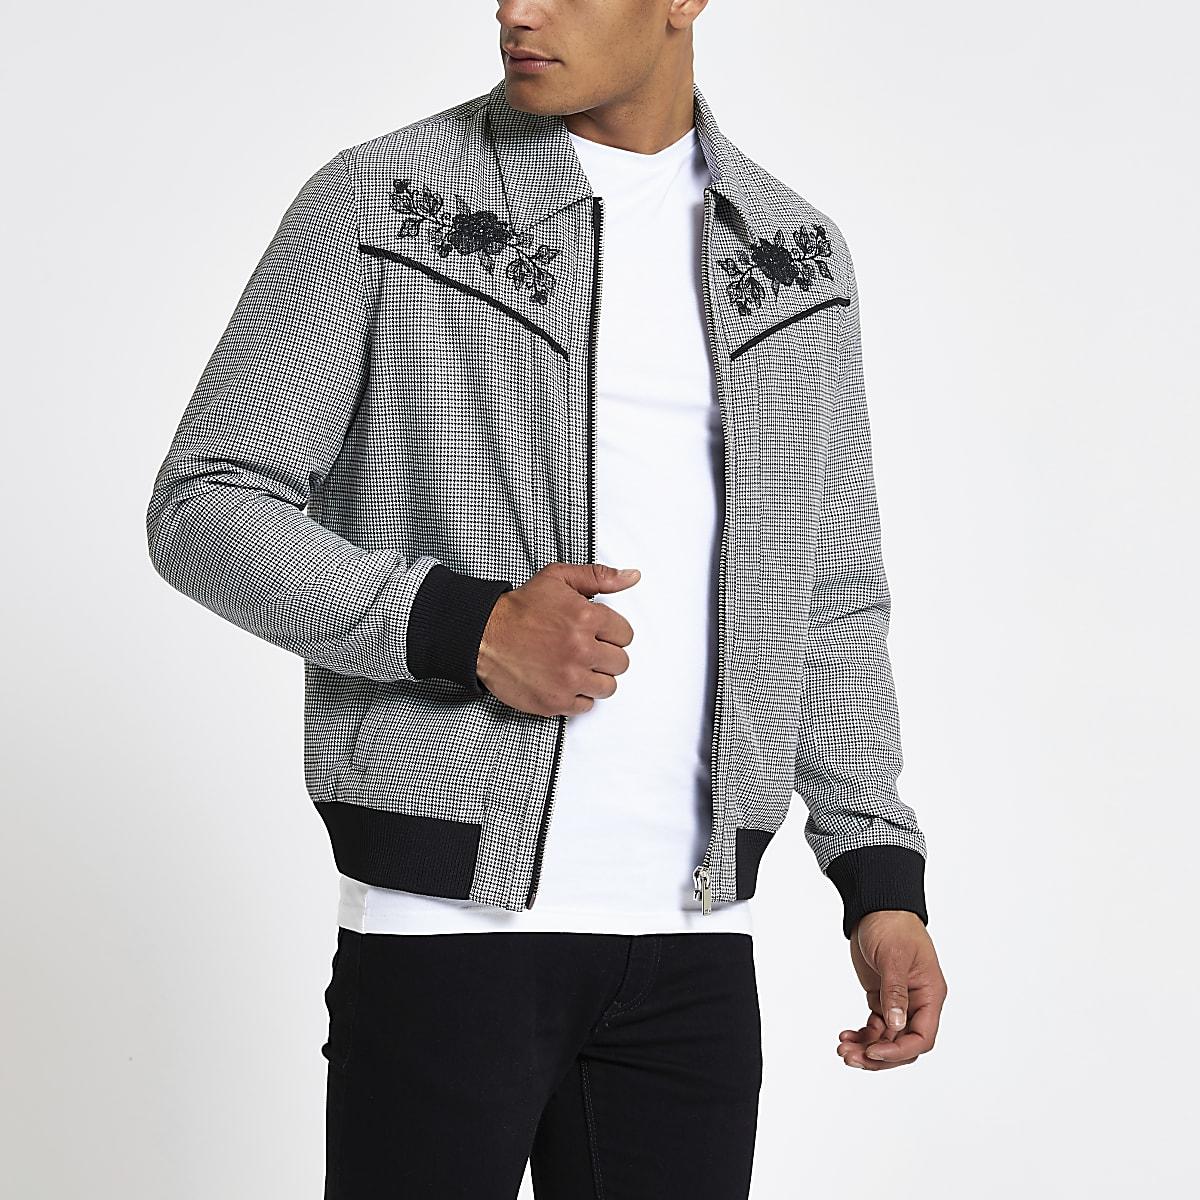 Black check floral embroidered western jacket